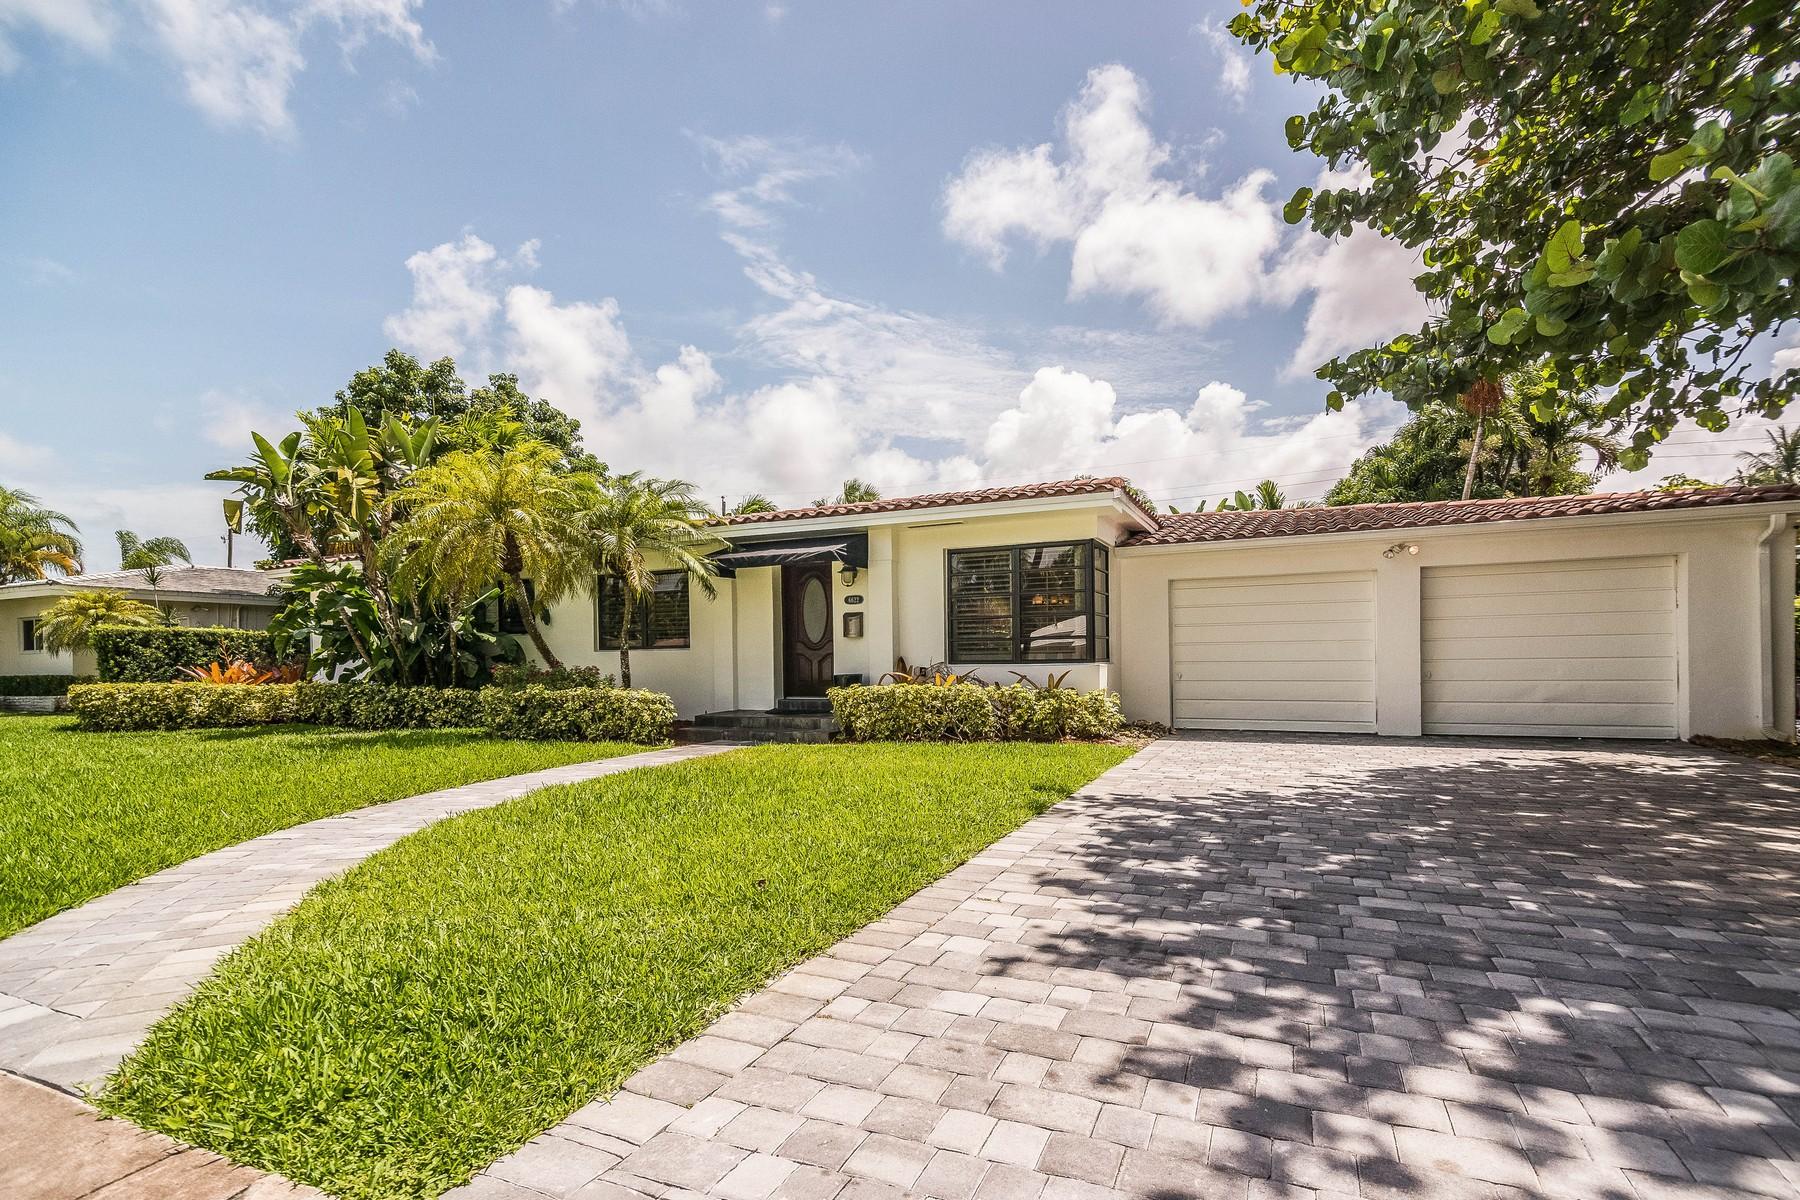 Property For Sale at 6622 Santora St Coral Gables, FL 33146